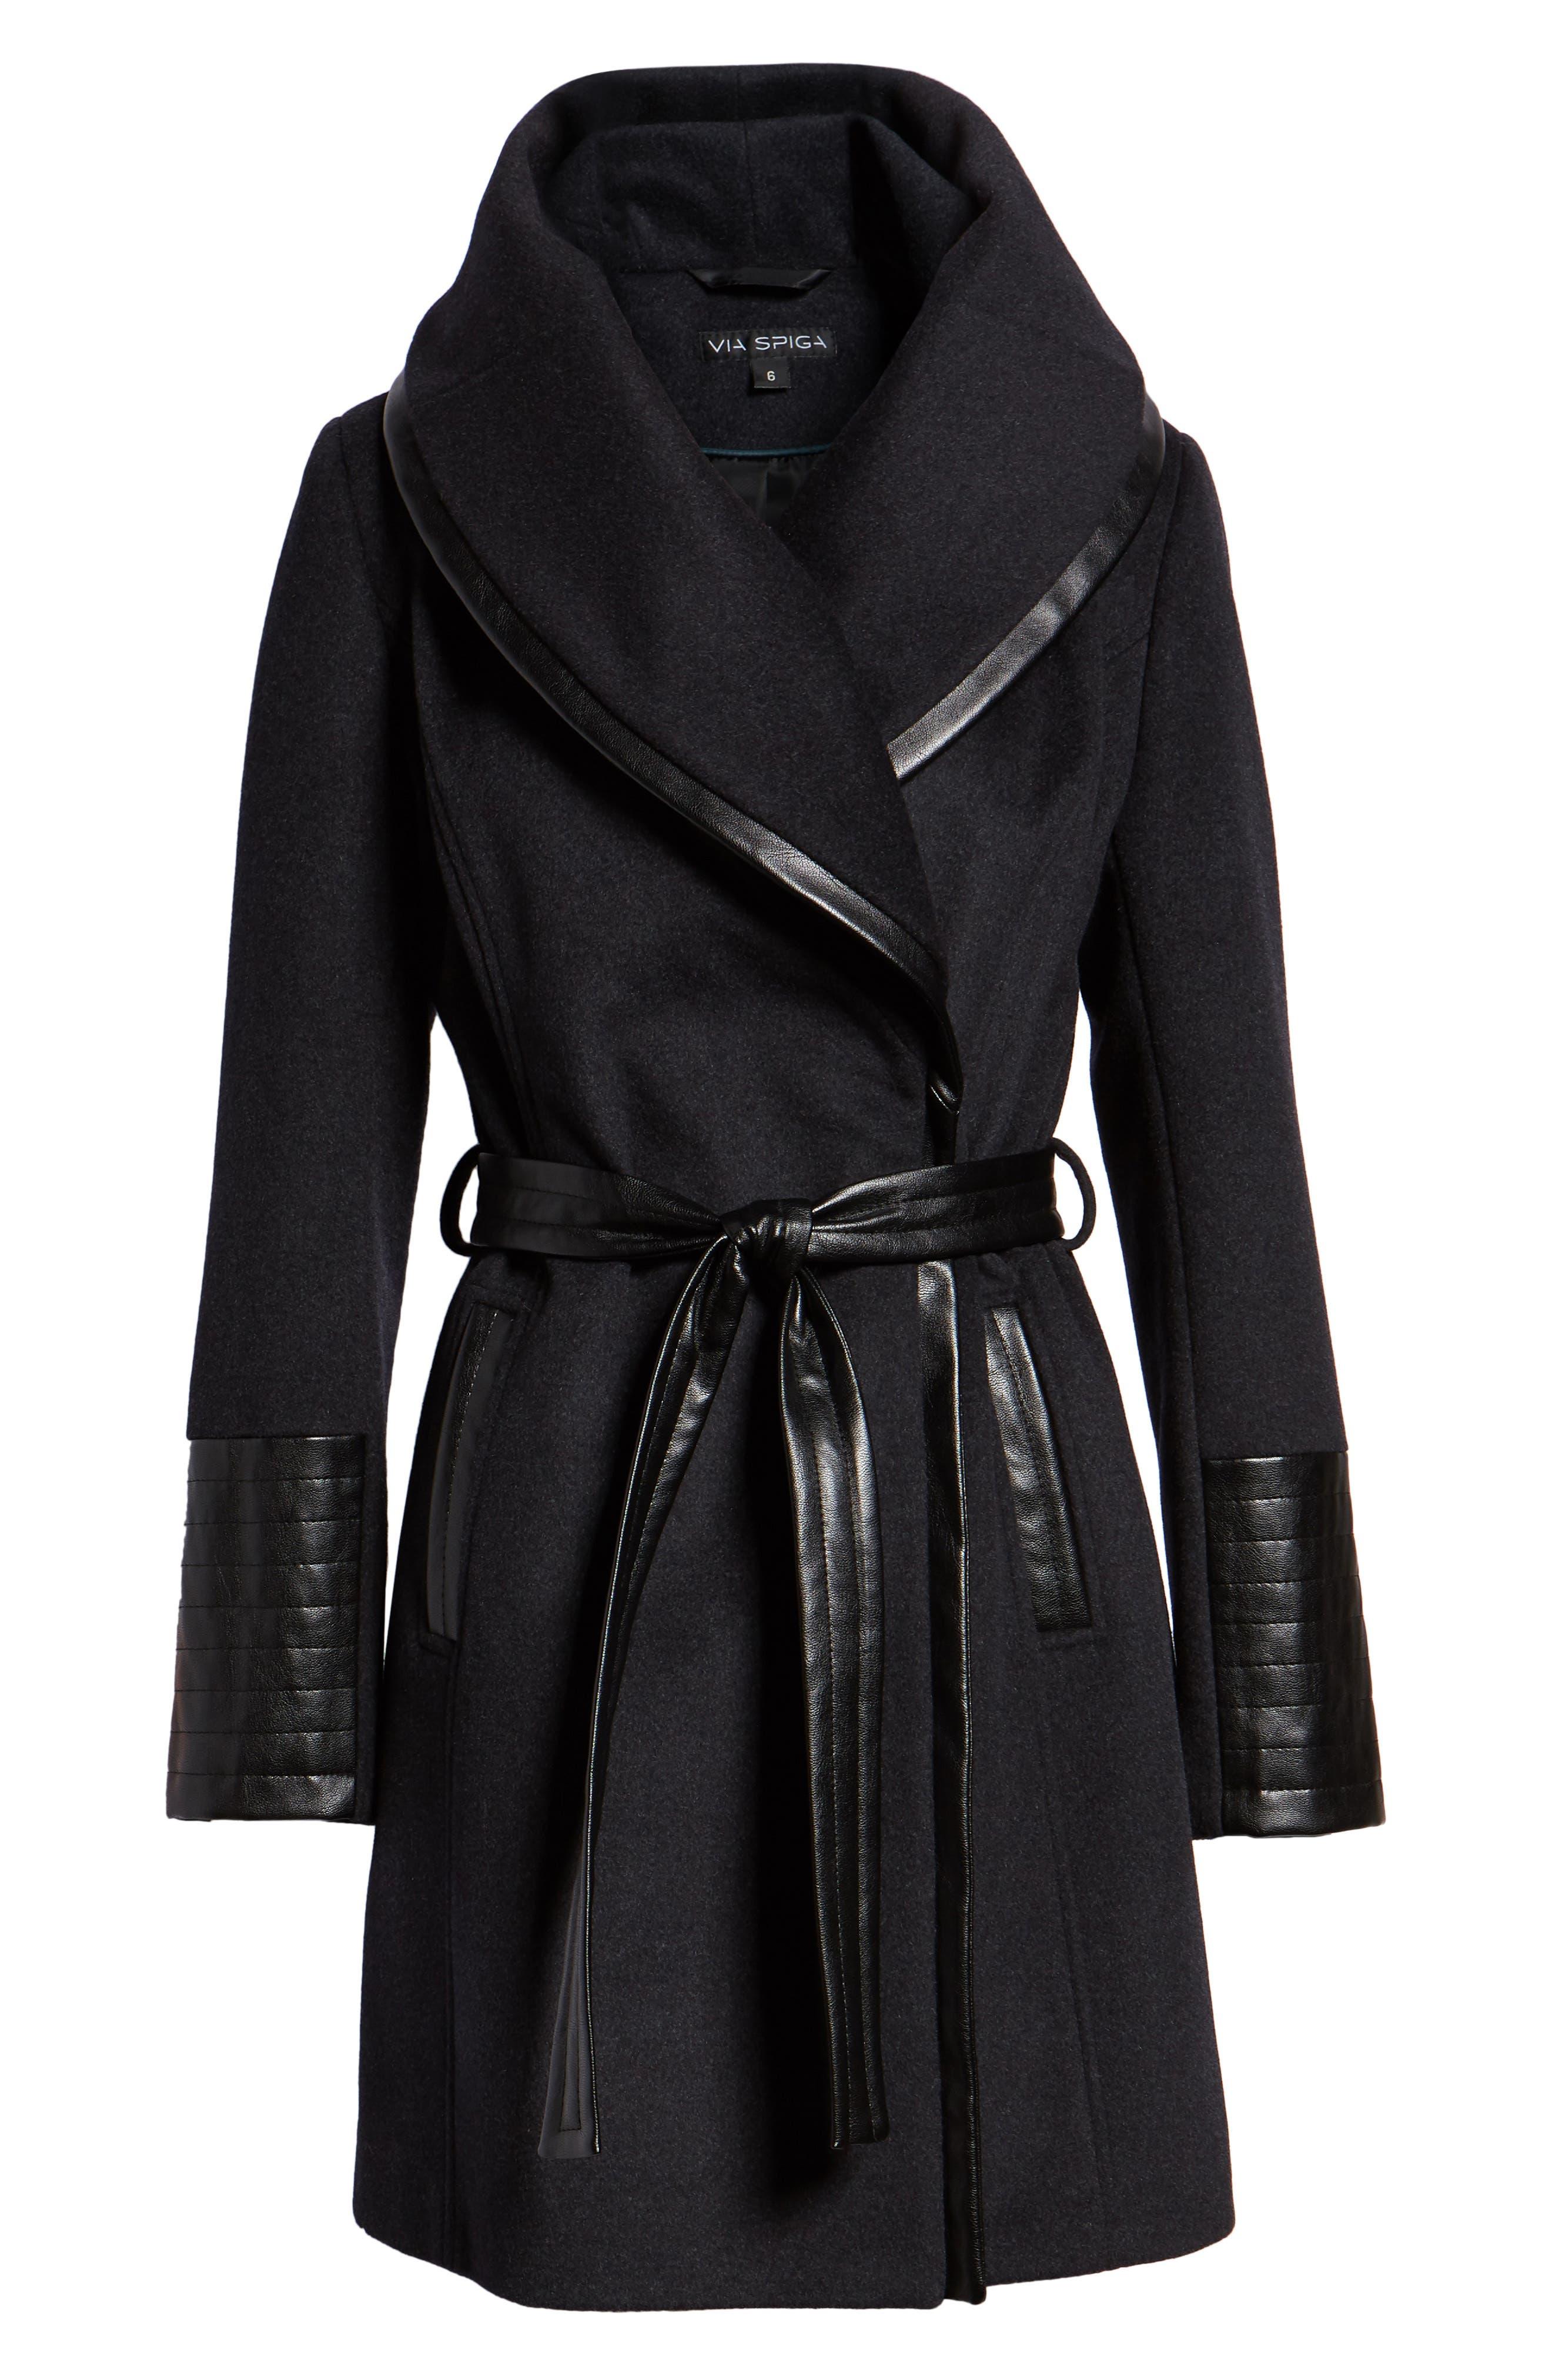 VIA SPIGA,                             Wool Blend Coat,                             Alternate thumbnail 6, color,                             CHARCOAL